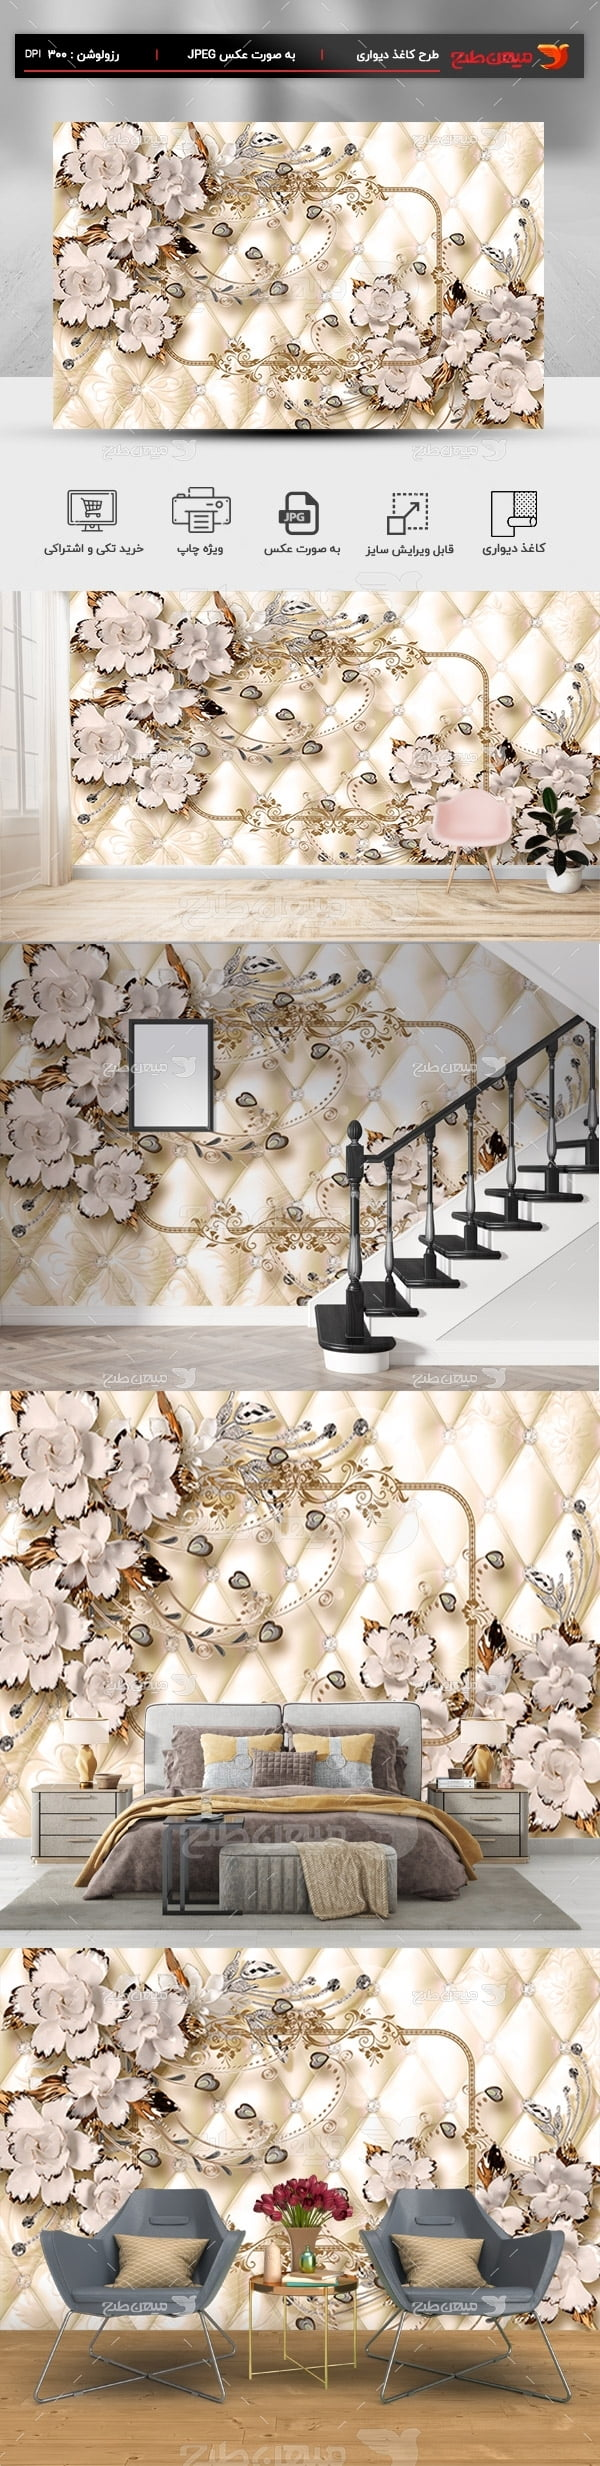 پوستر کاغذ دیواری سه بعدی کرم با طرح گل